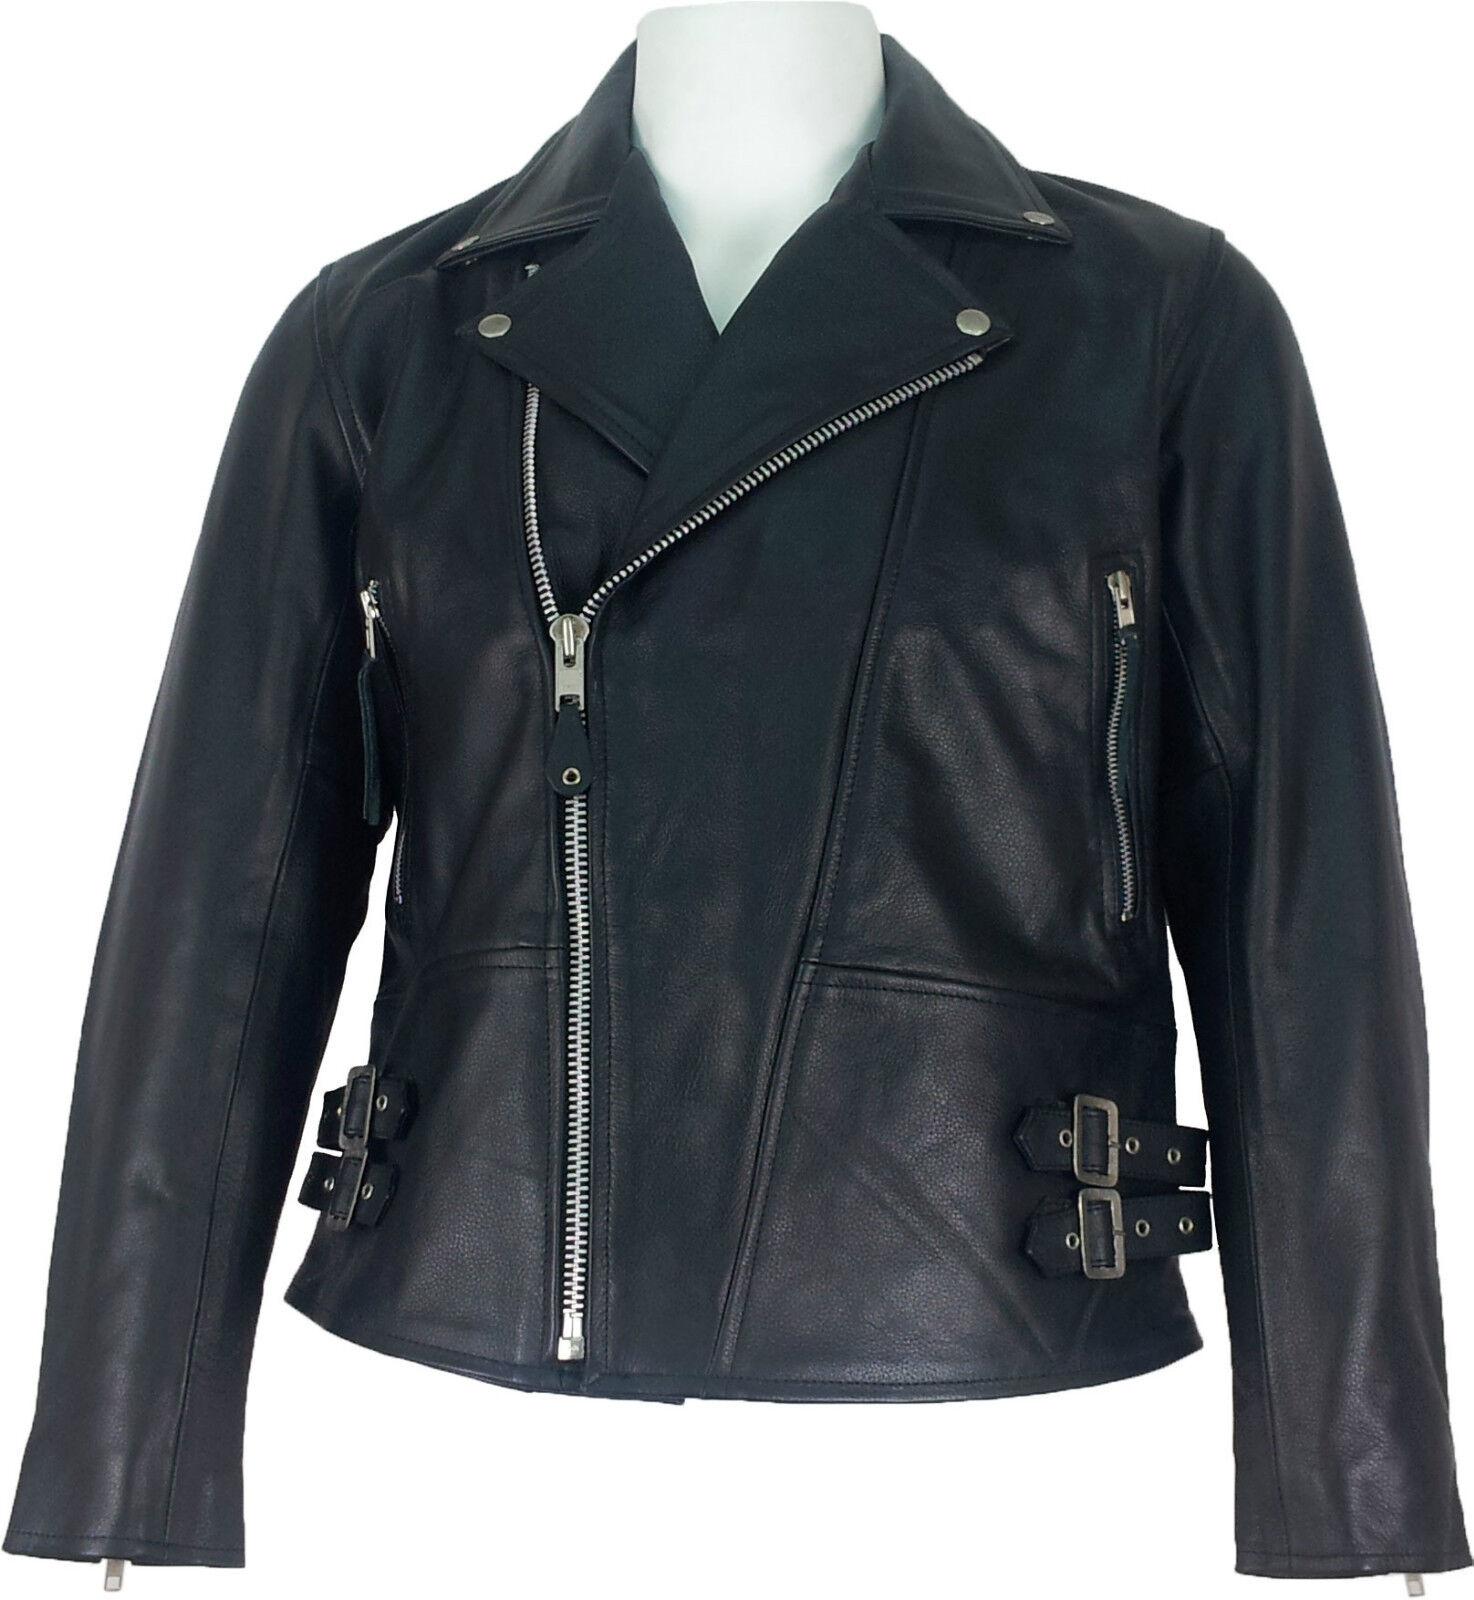 UNICORN men real cuero chaqueta Estilo clásico motorista black  C5